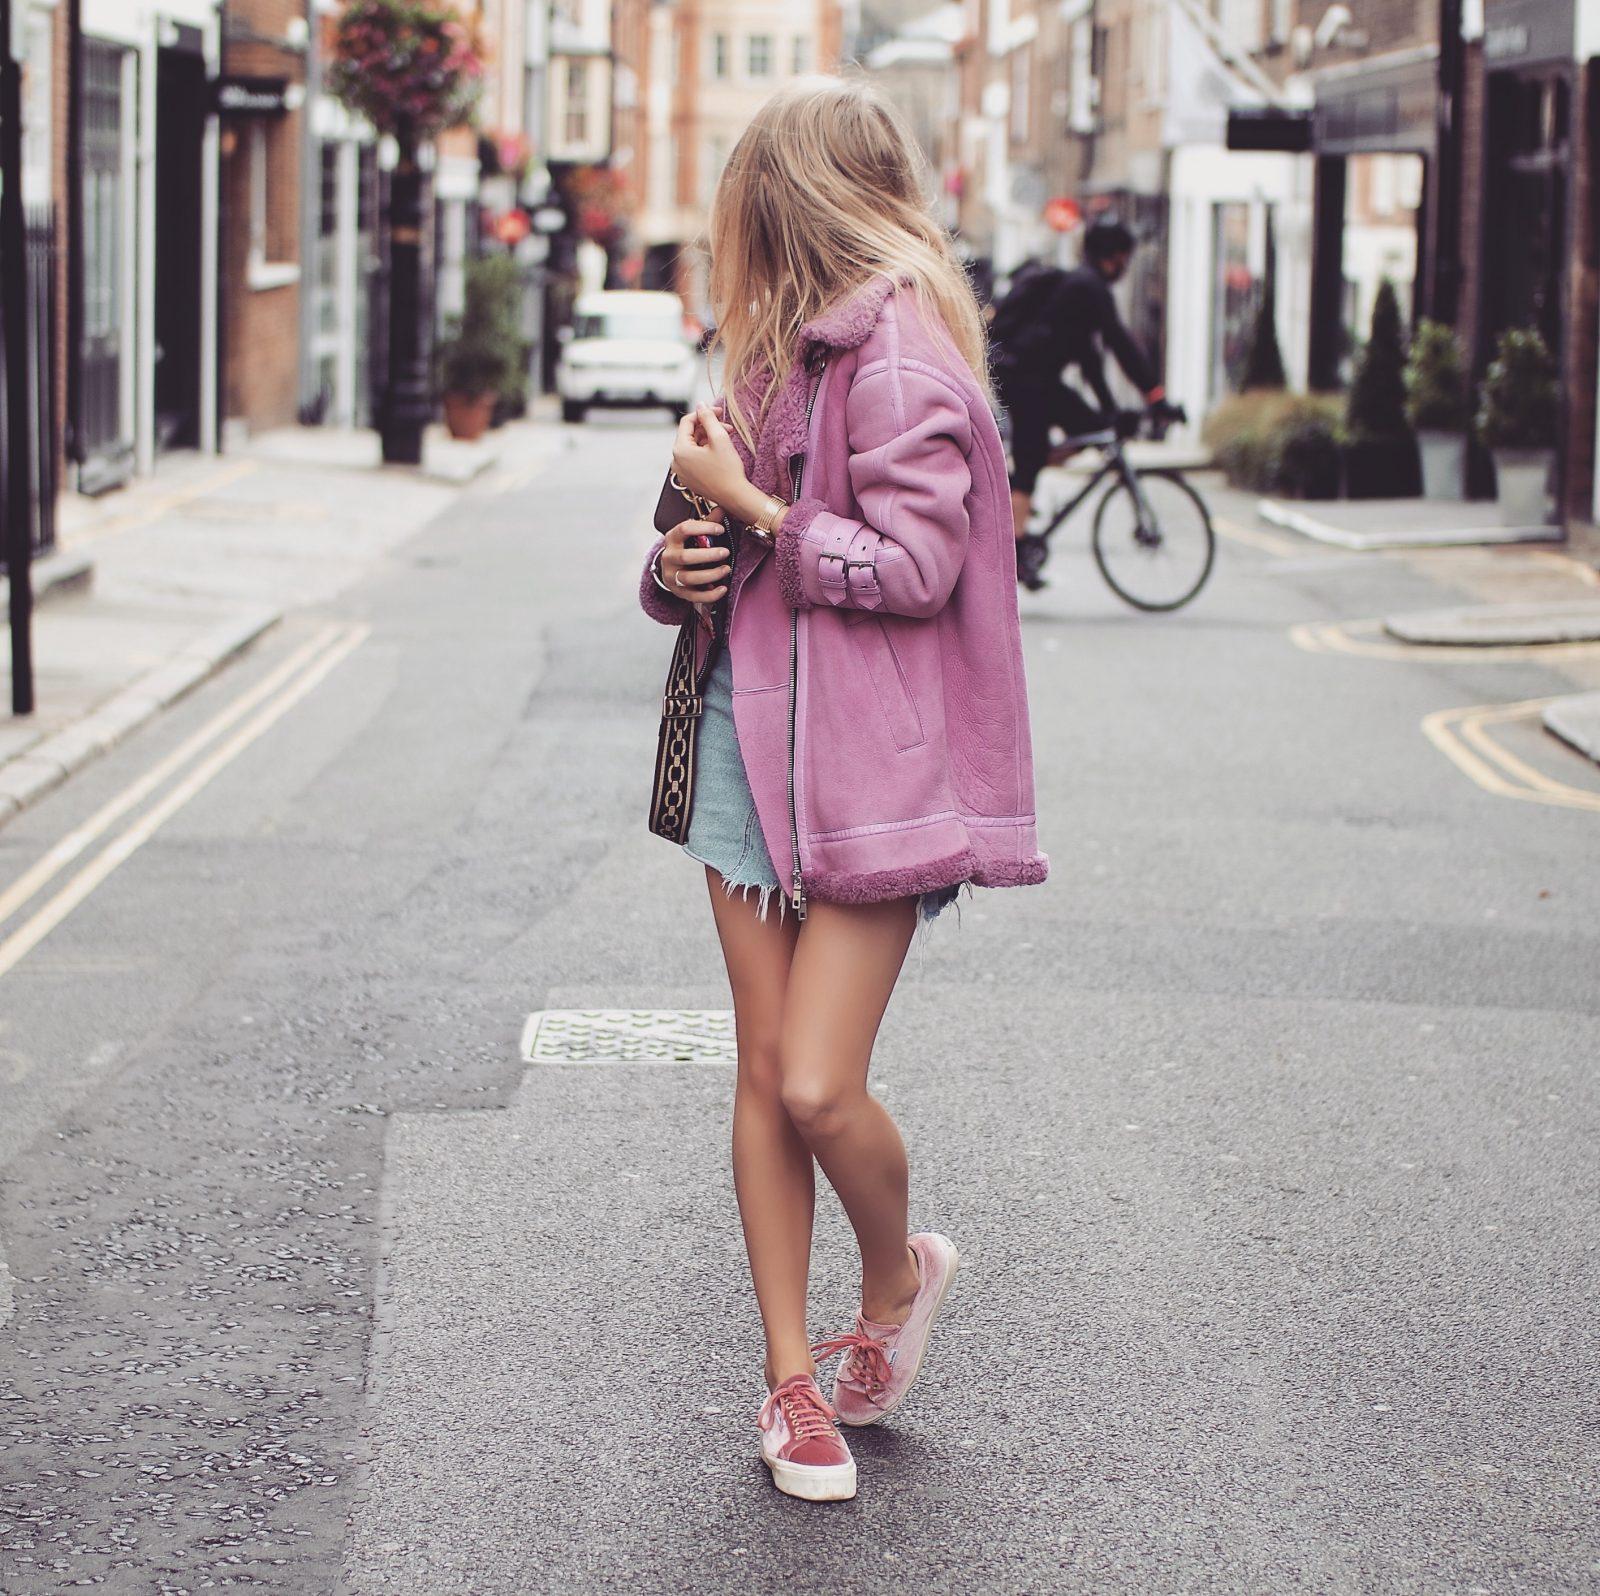 LFW Outfit - Pinko Pink Aviator Jacket - Fashion Blogger Sinead Crowe